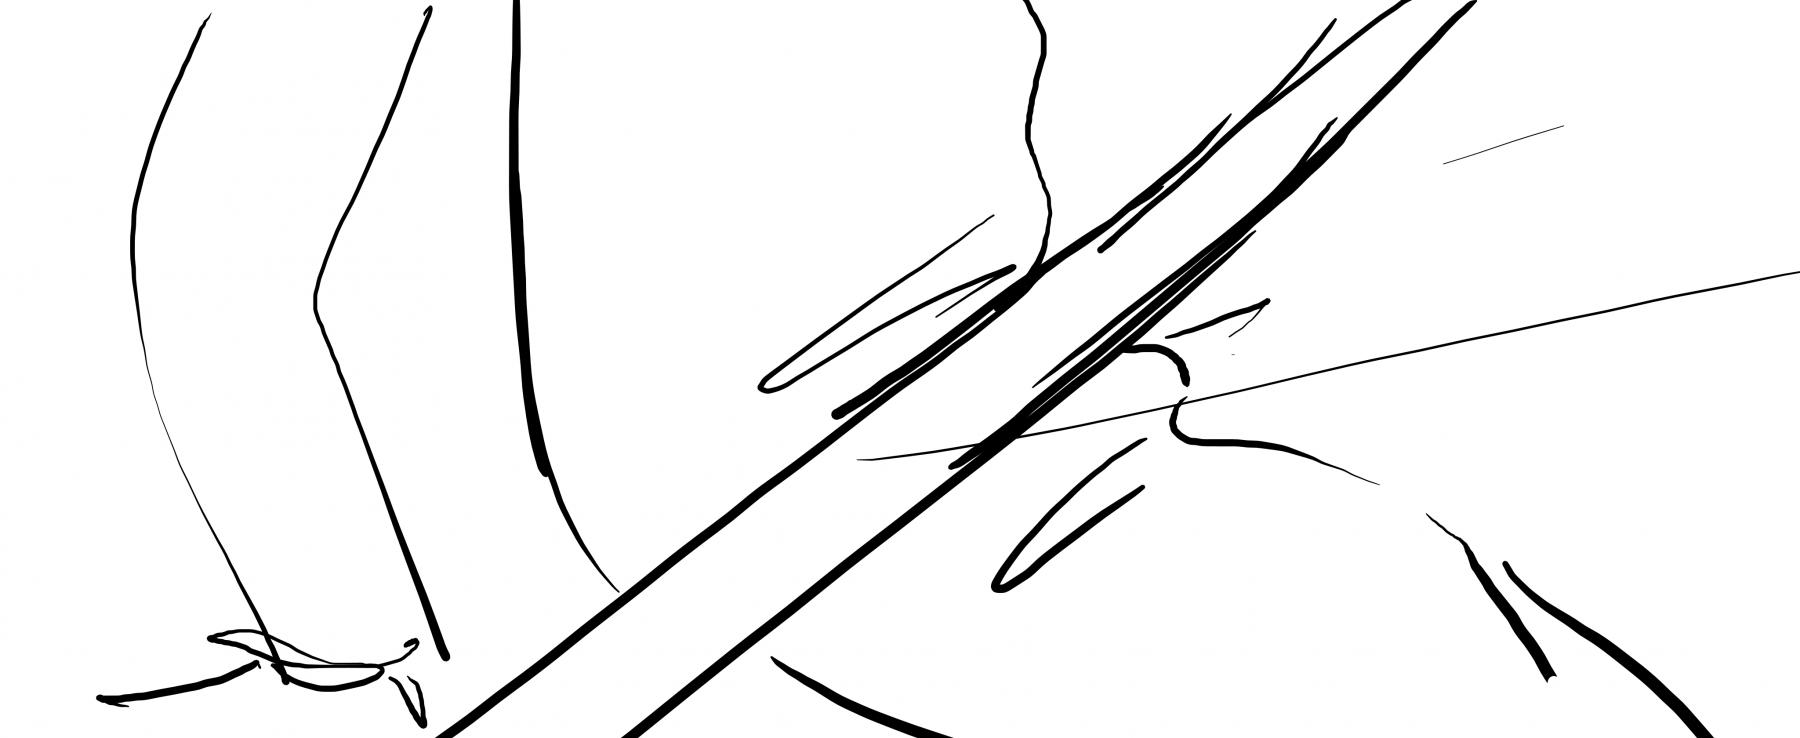 Nut-Thumbnail-Rough-Board00270